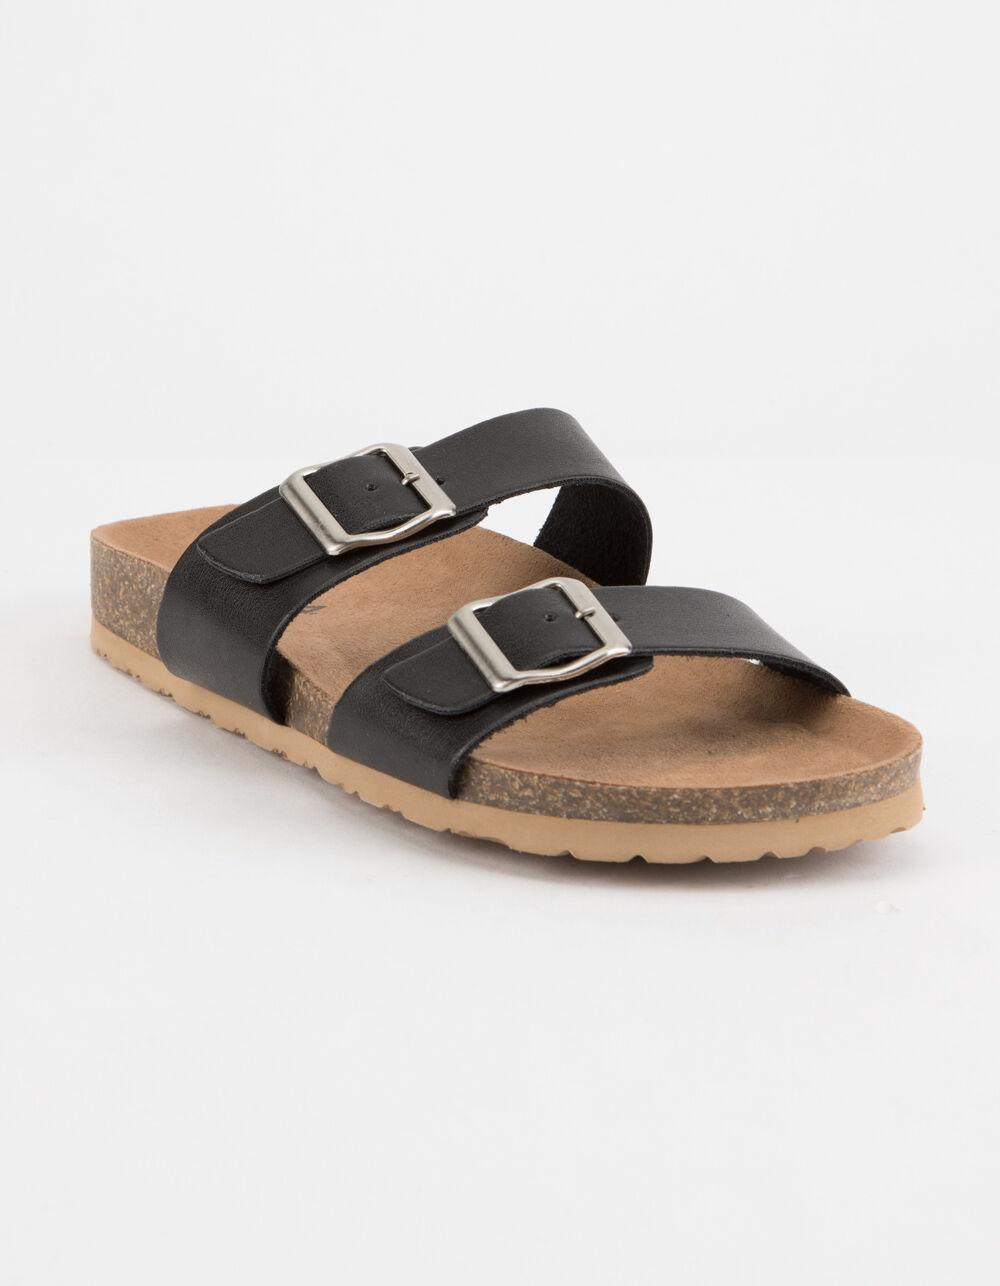 SODA Double Buckle Slide Sandals